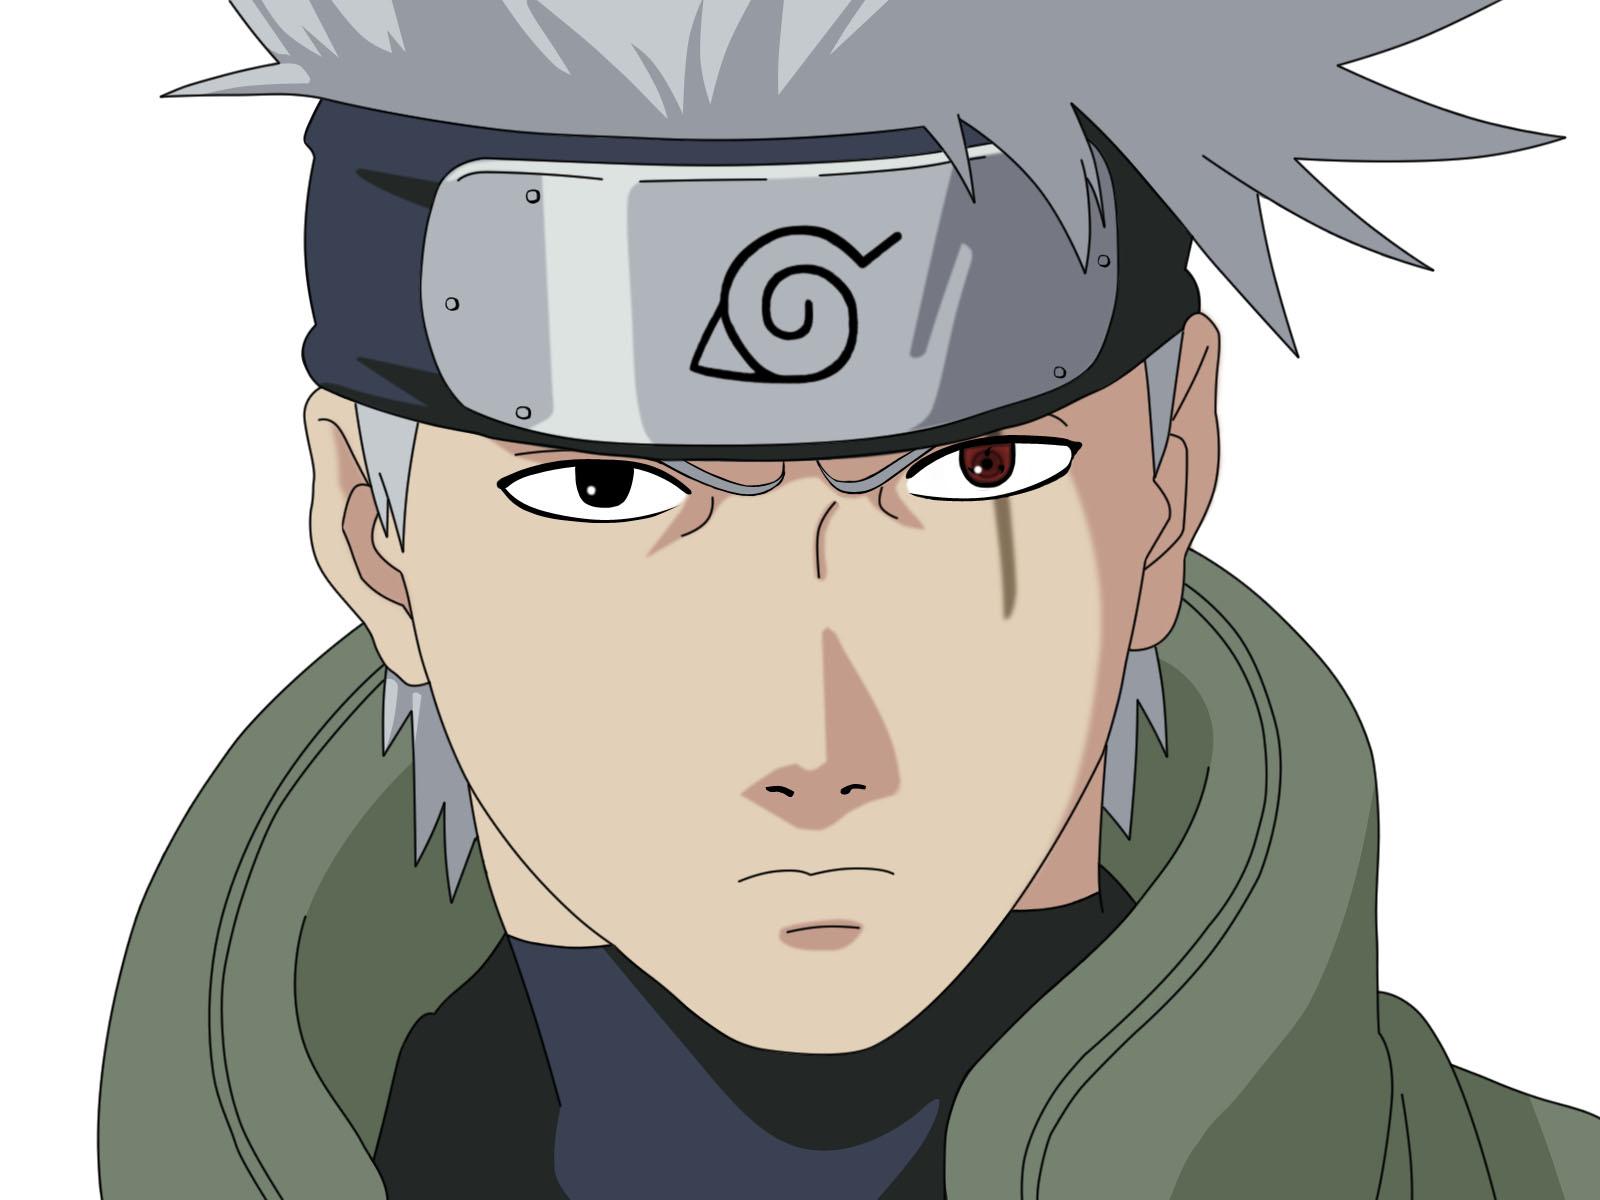 If Kakashi dies, will Kishi show his face?